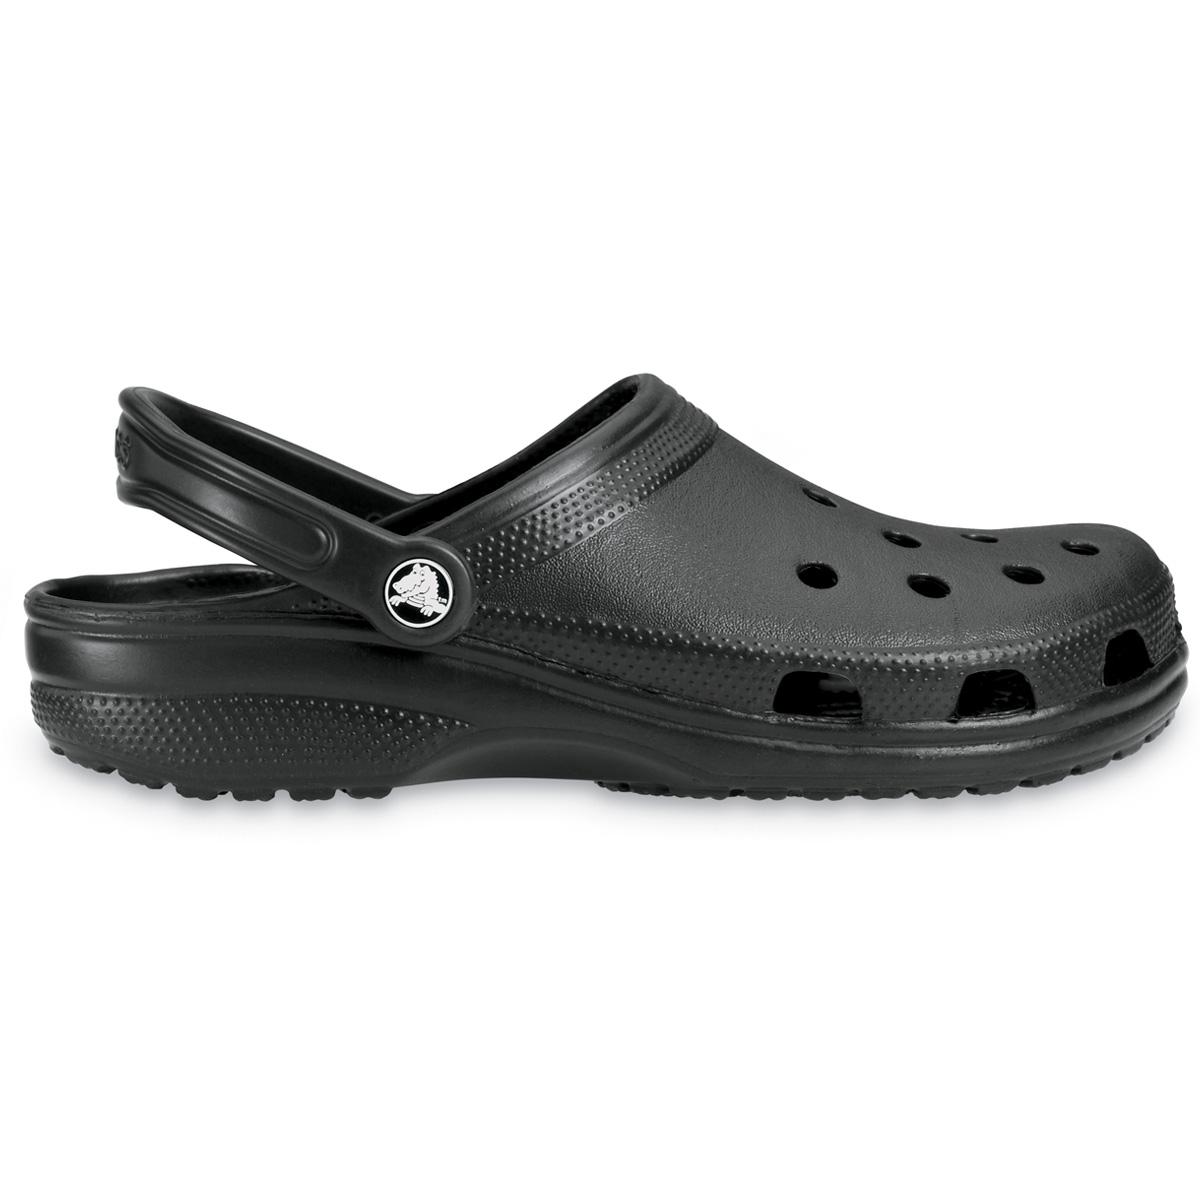 Crocs Classic - Siyah